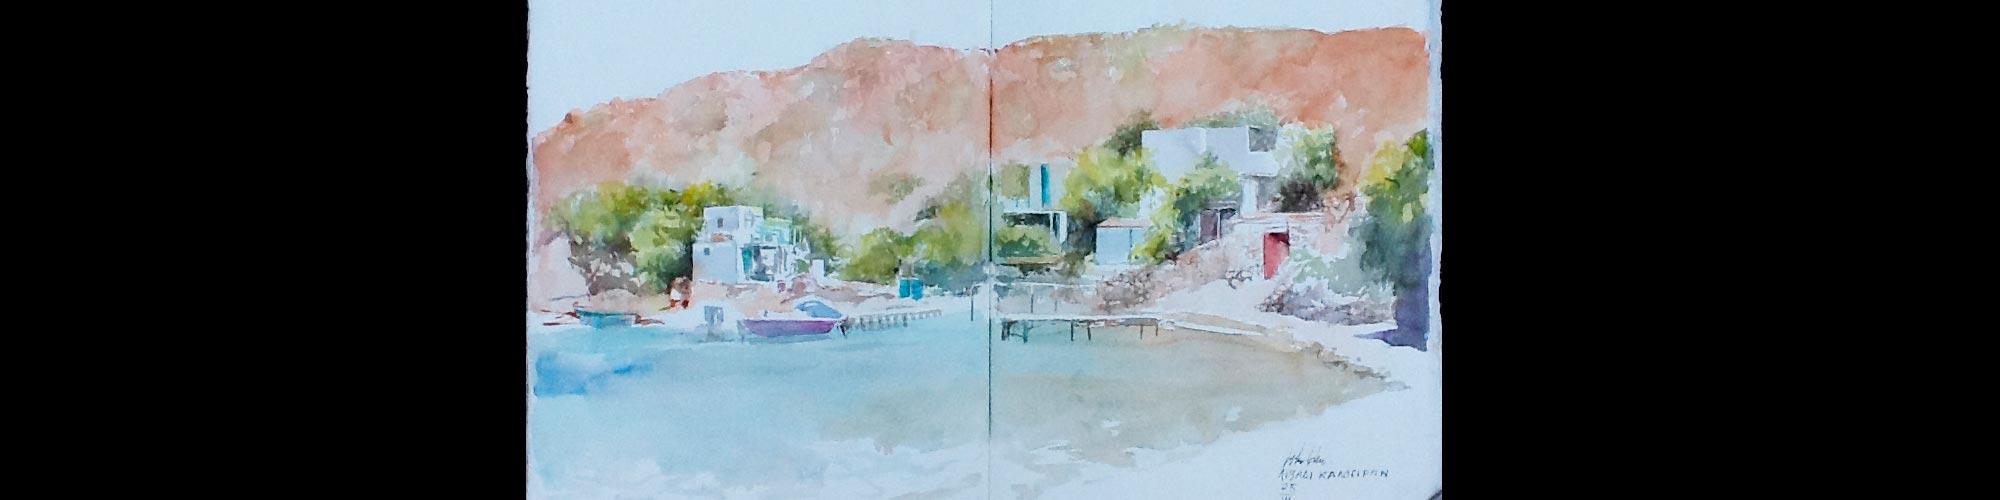 Acuarela en Egeo- EL PAIS Viajes